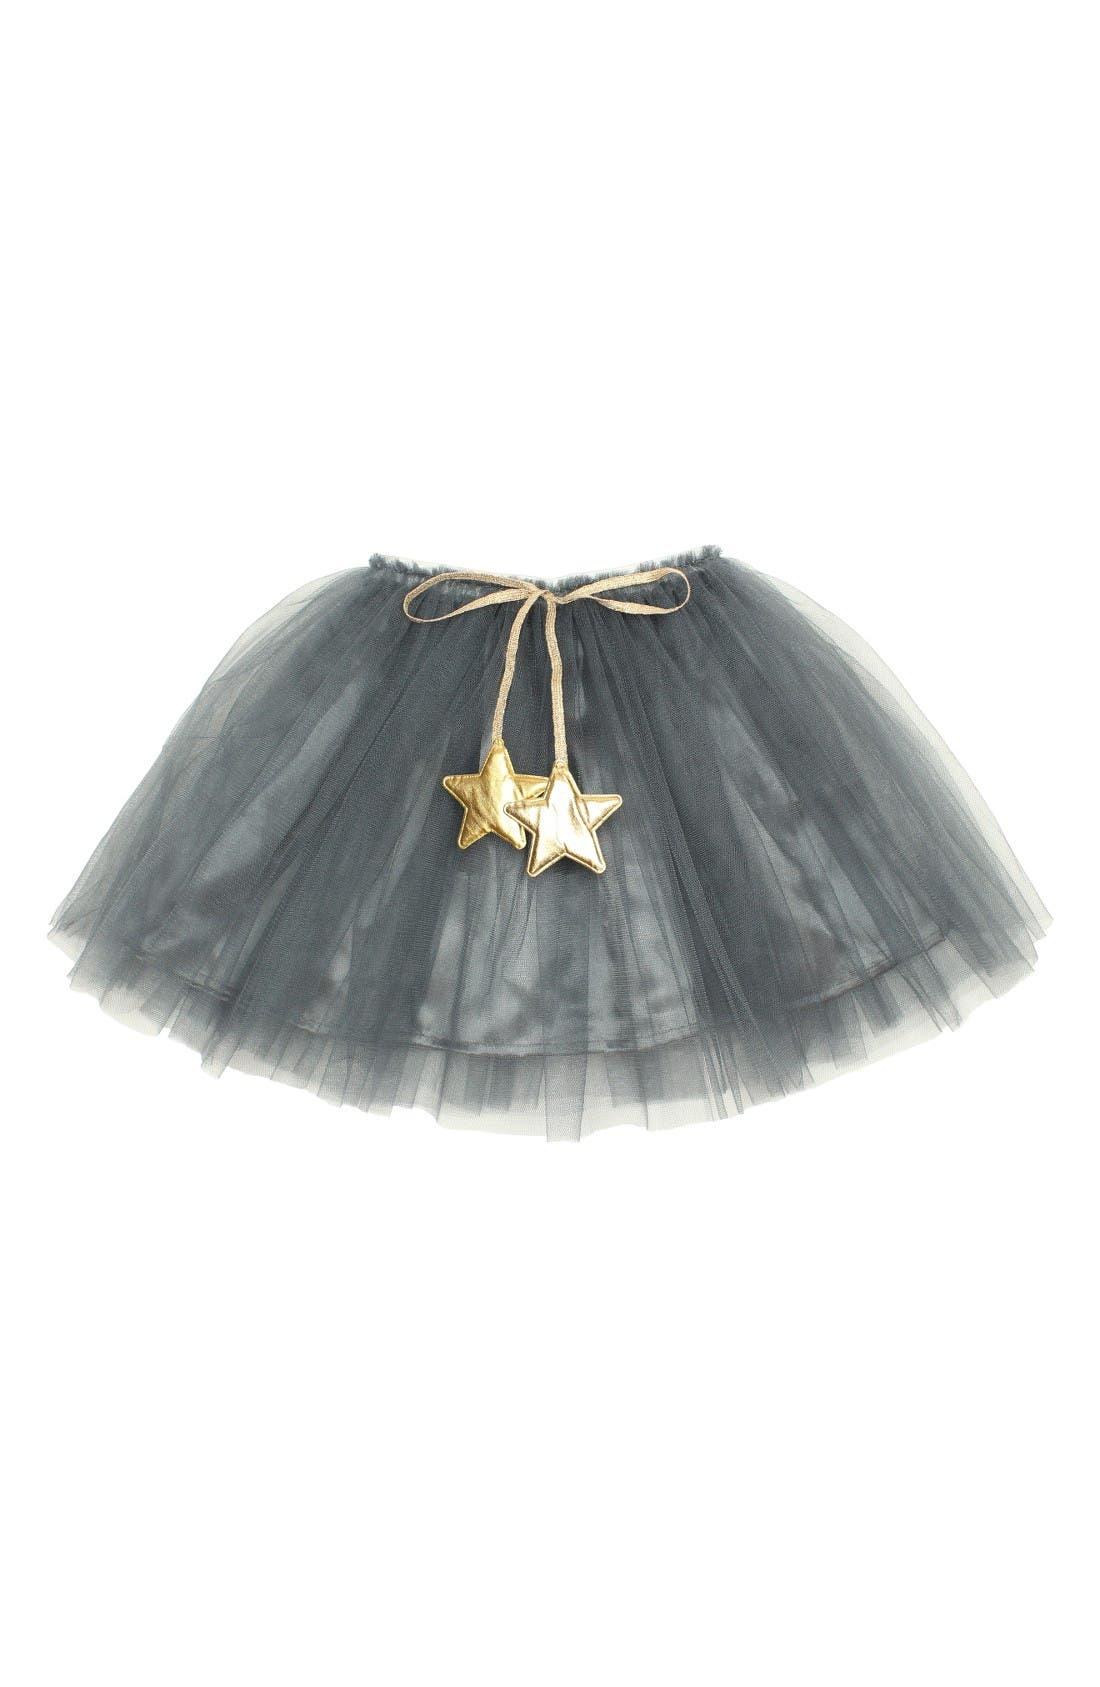 Main Image - Popatu Gold Star Tutu Skirt (Toddler Girls & Little Girls)